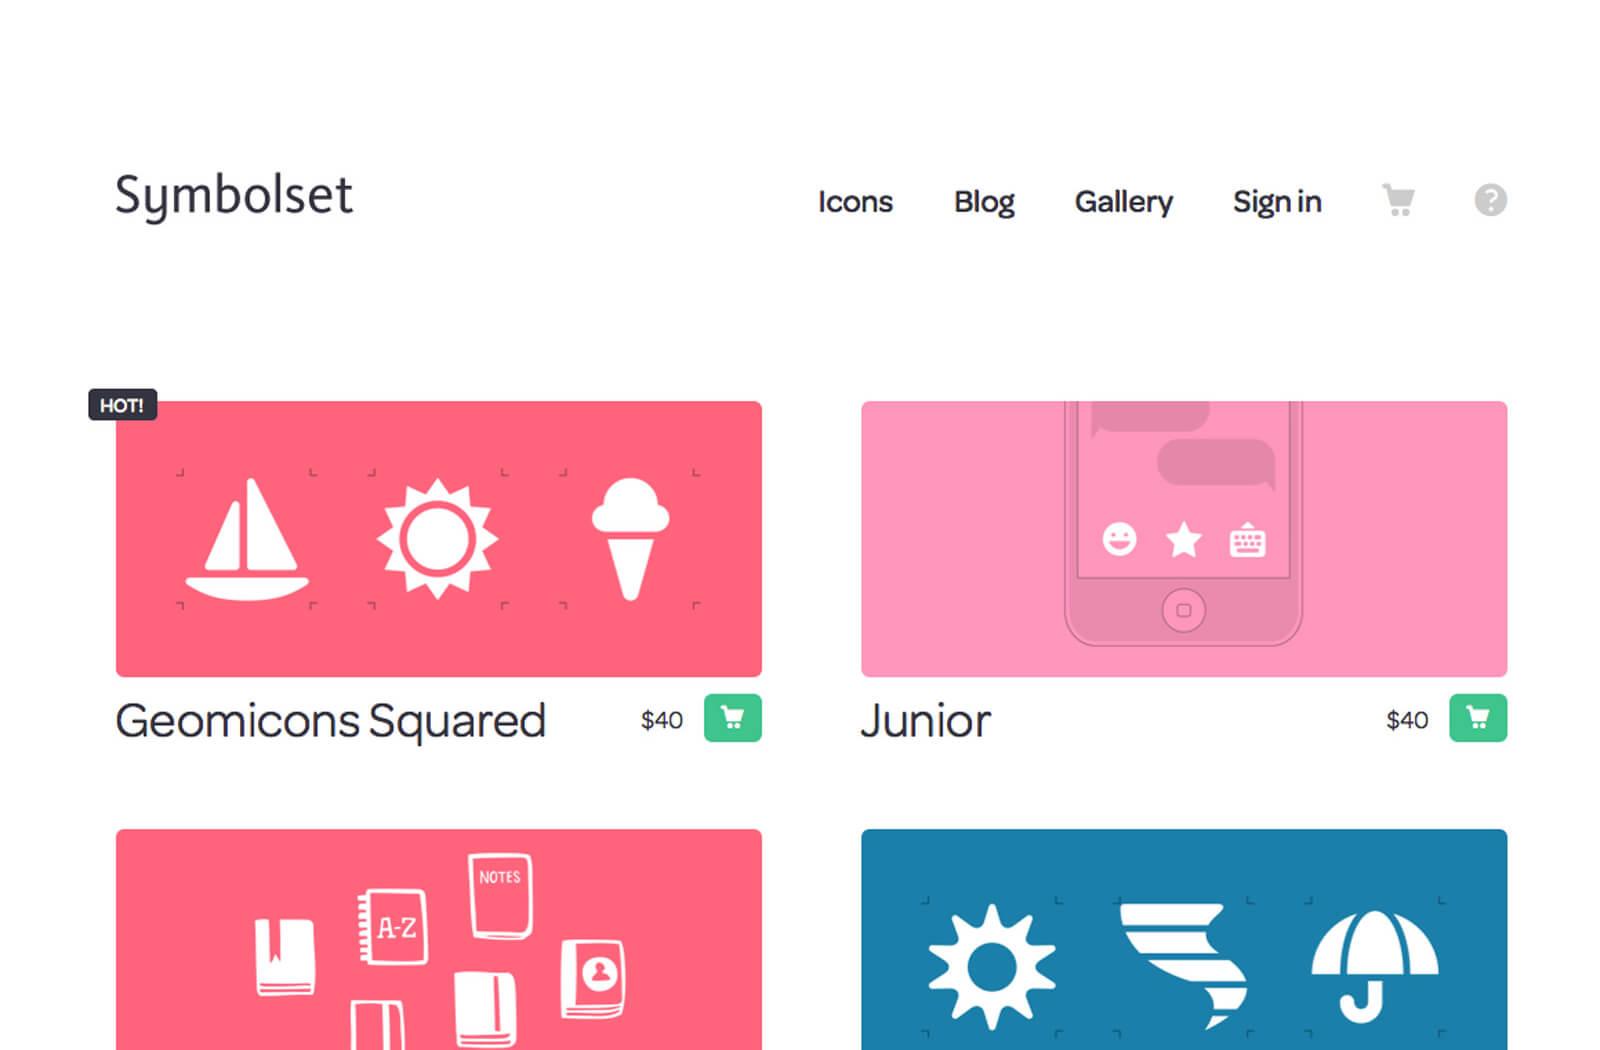 premium icon sets from symbol set